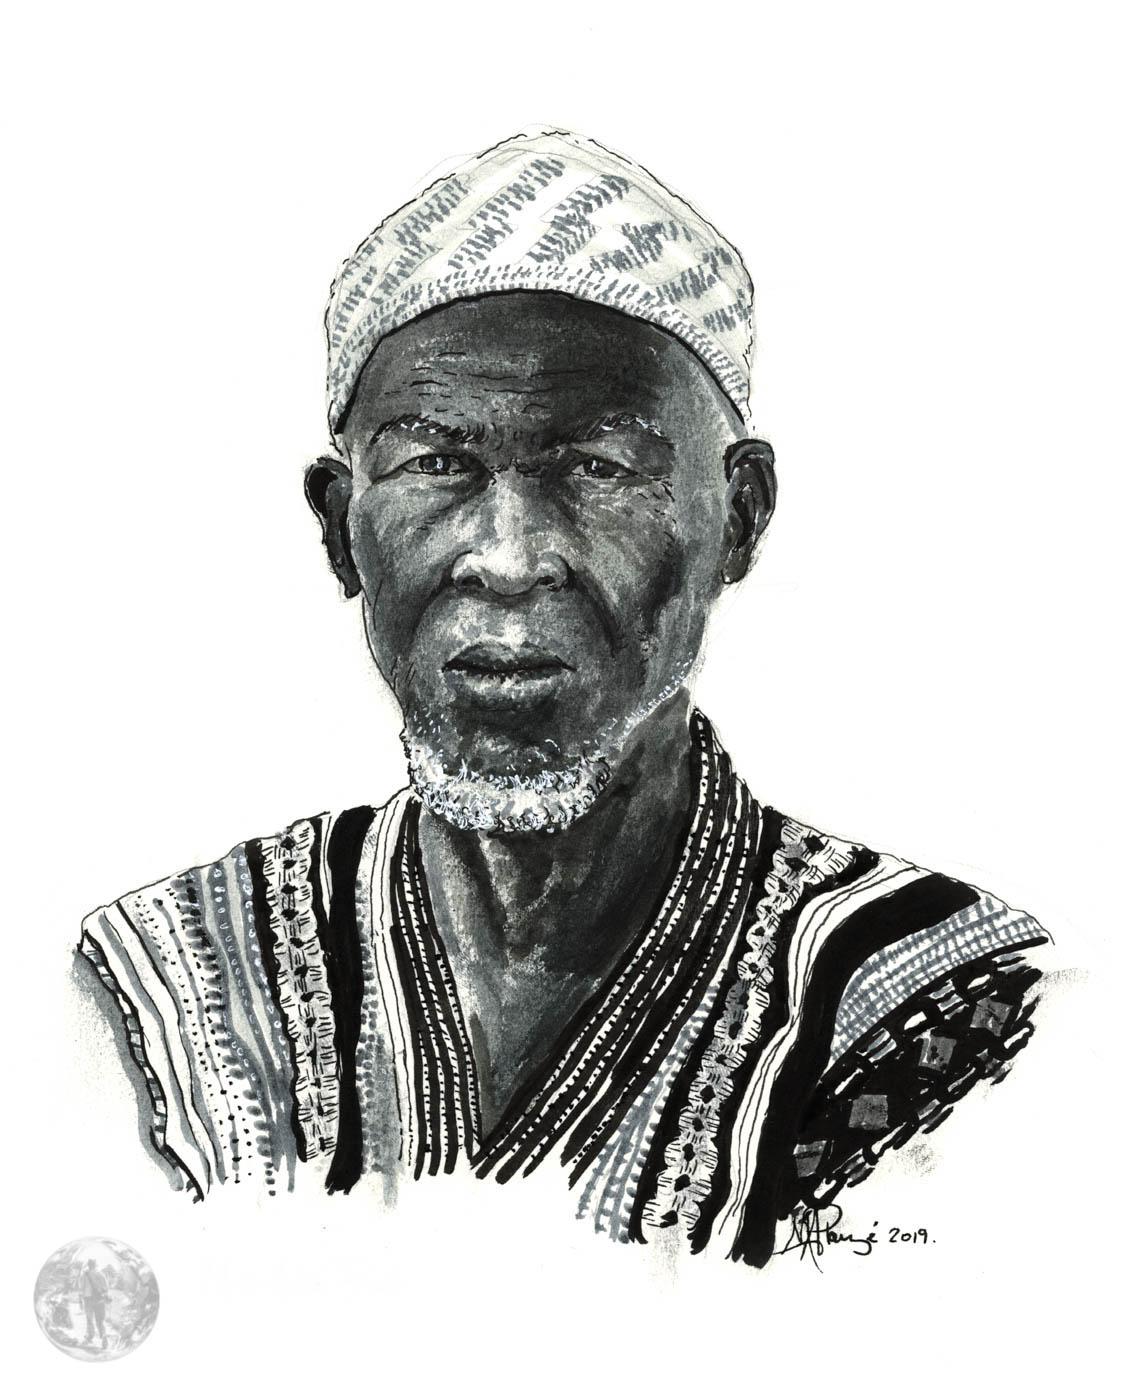 Regard-Jatigiya-Fleuve Niger-Mali-Sahel-